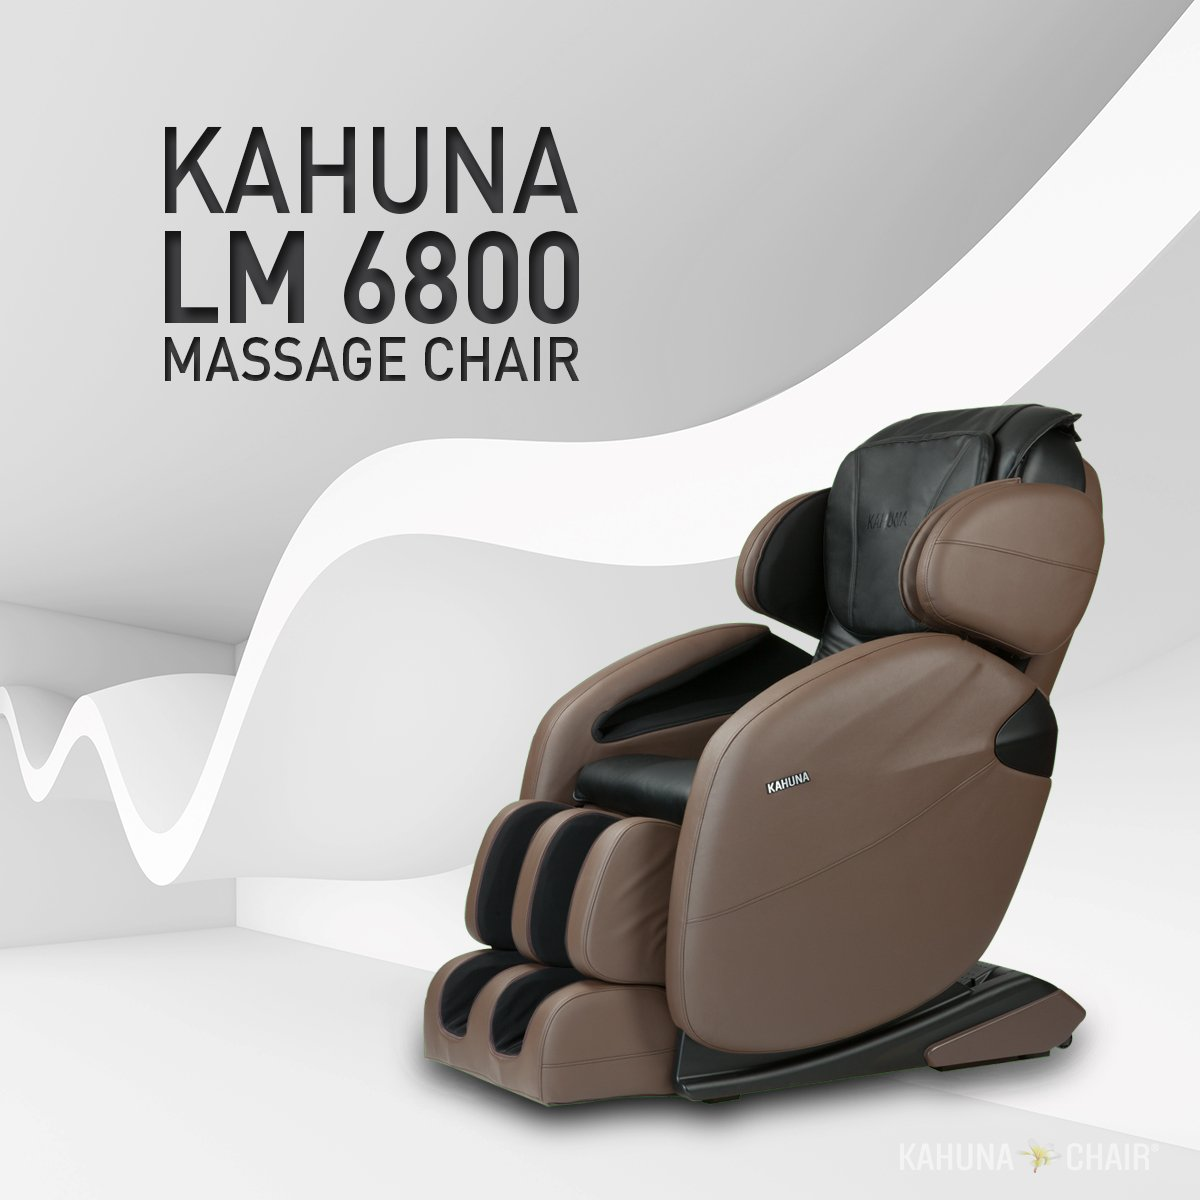 kahuna massage chair review